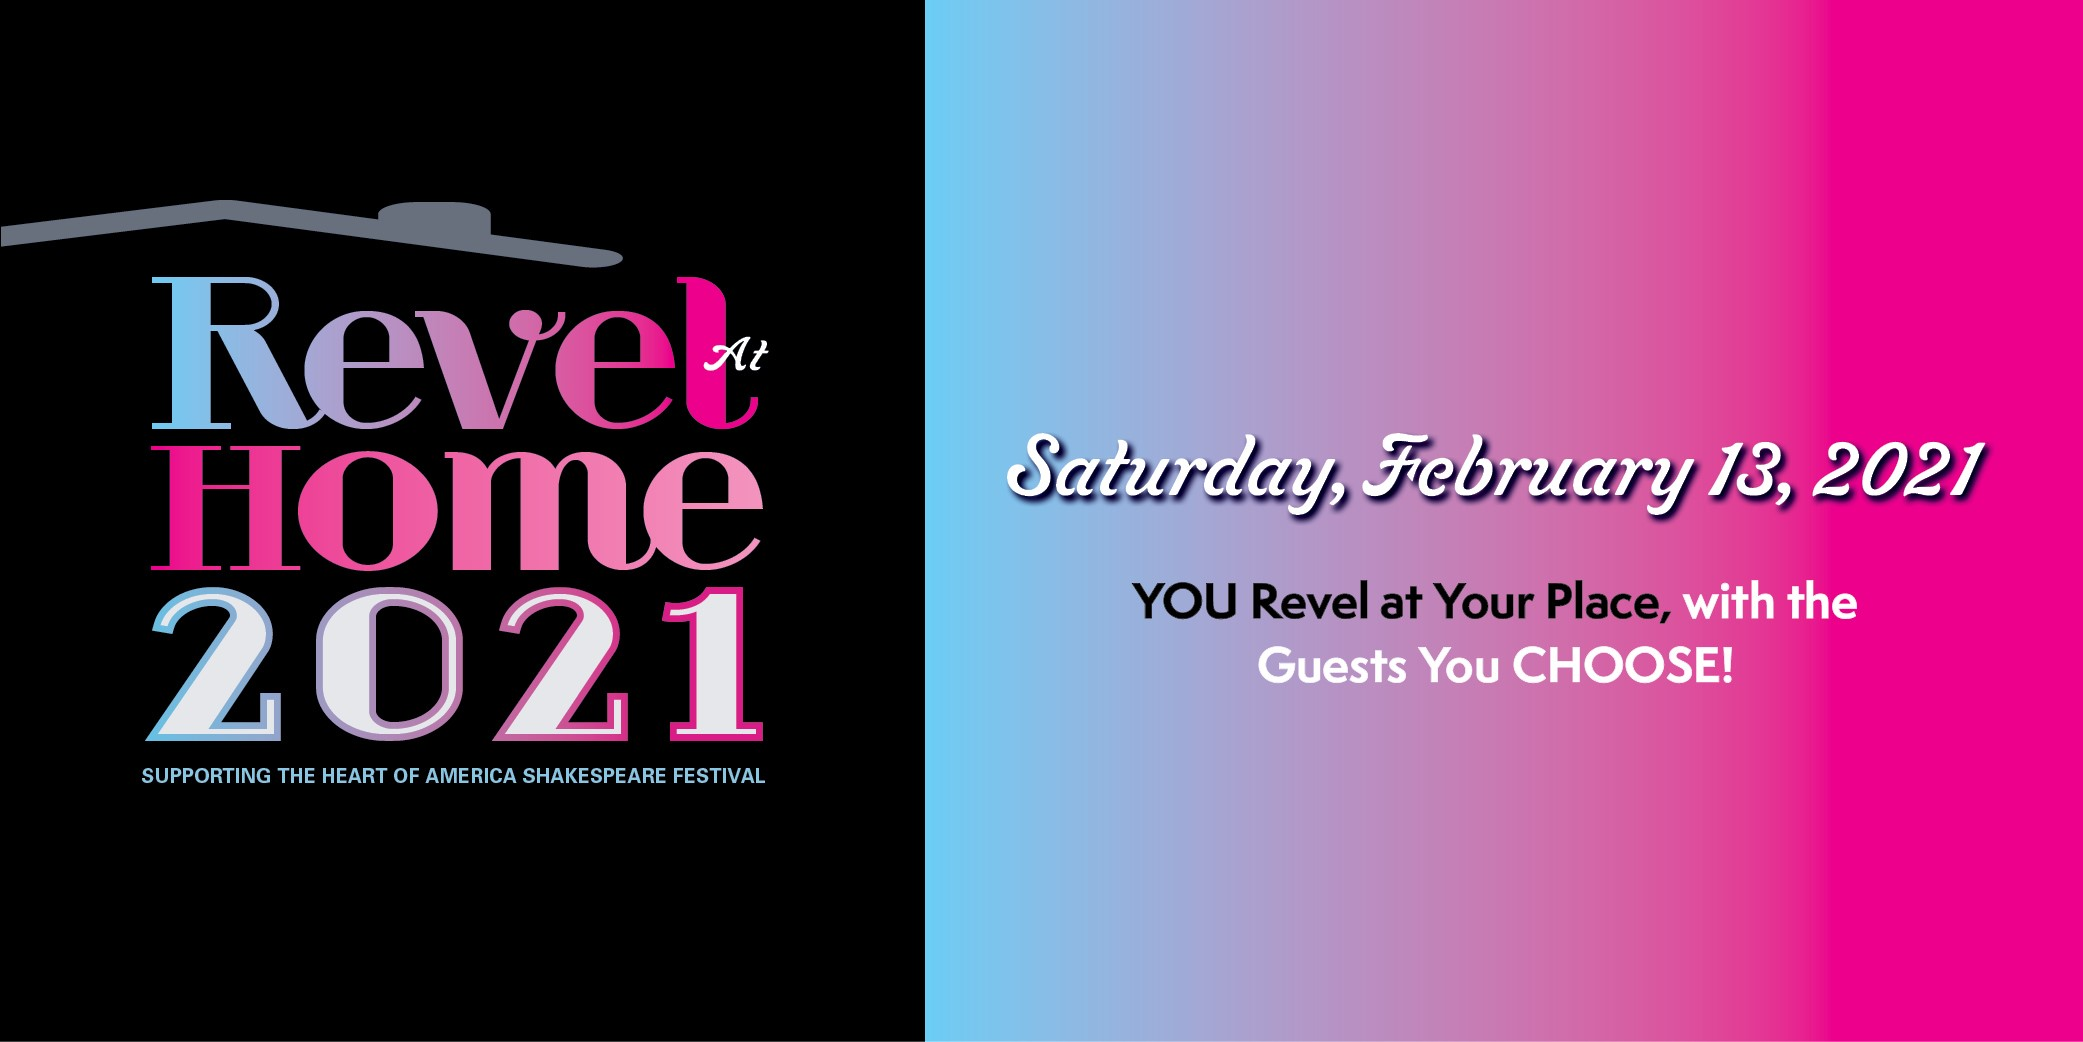 Revel at Home - Heart of America Shakespeare Festival Gala - Romantic Revels, Saturday February 13, 2021